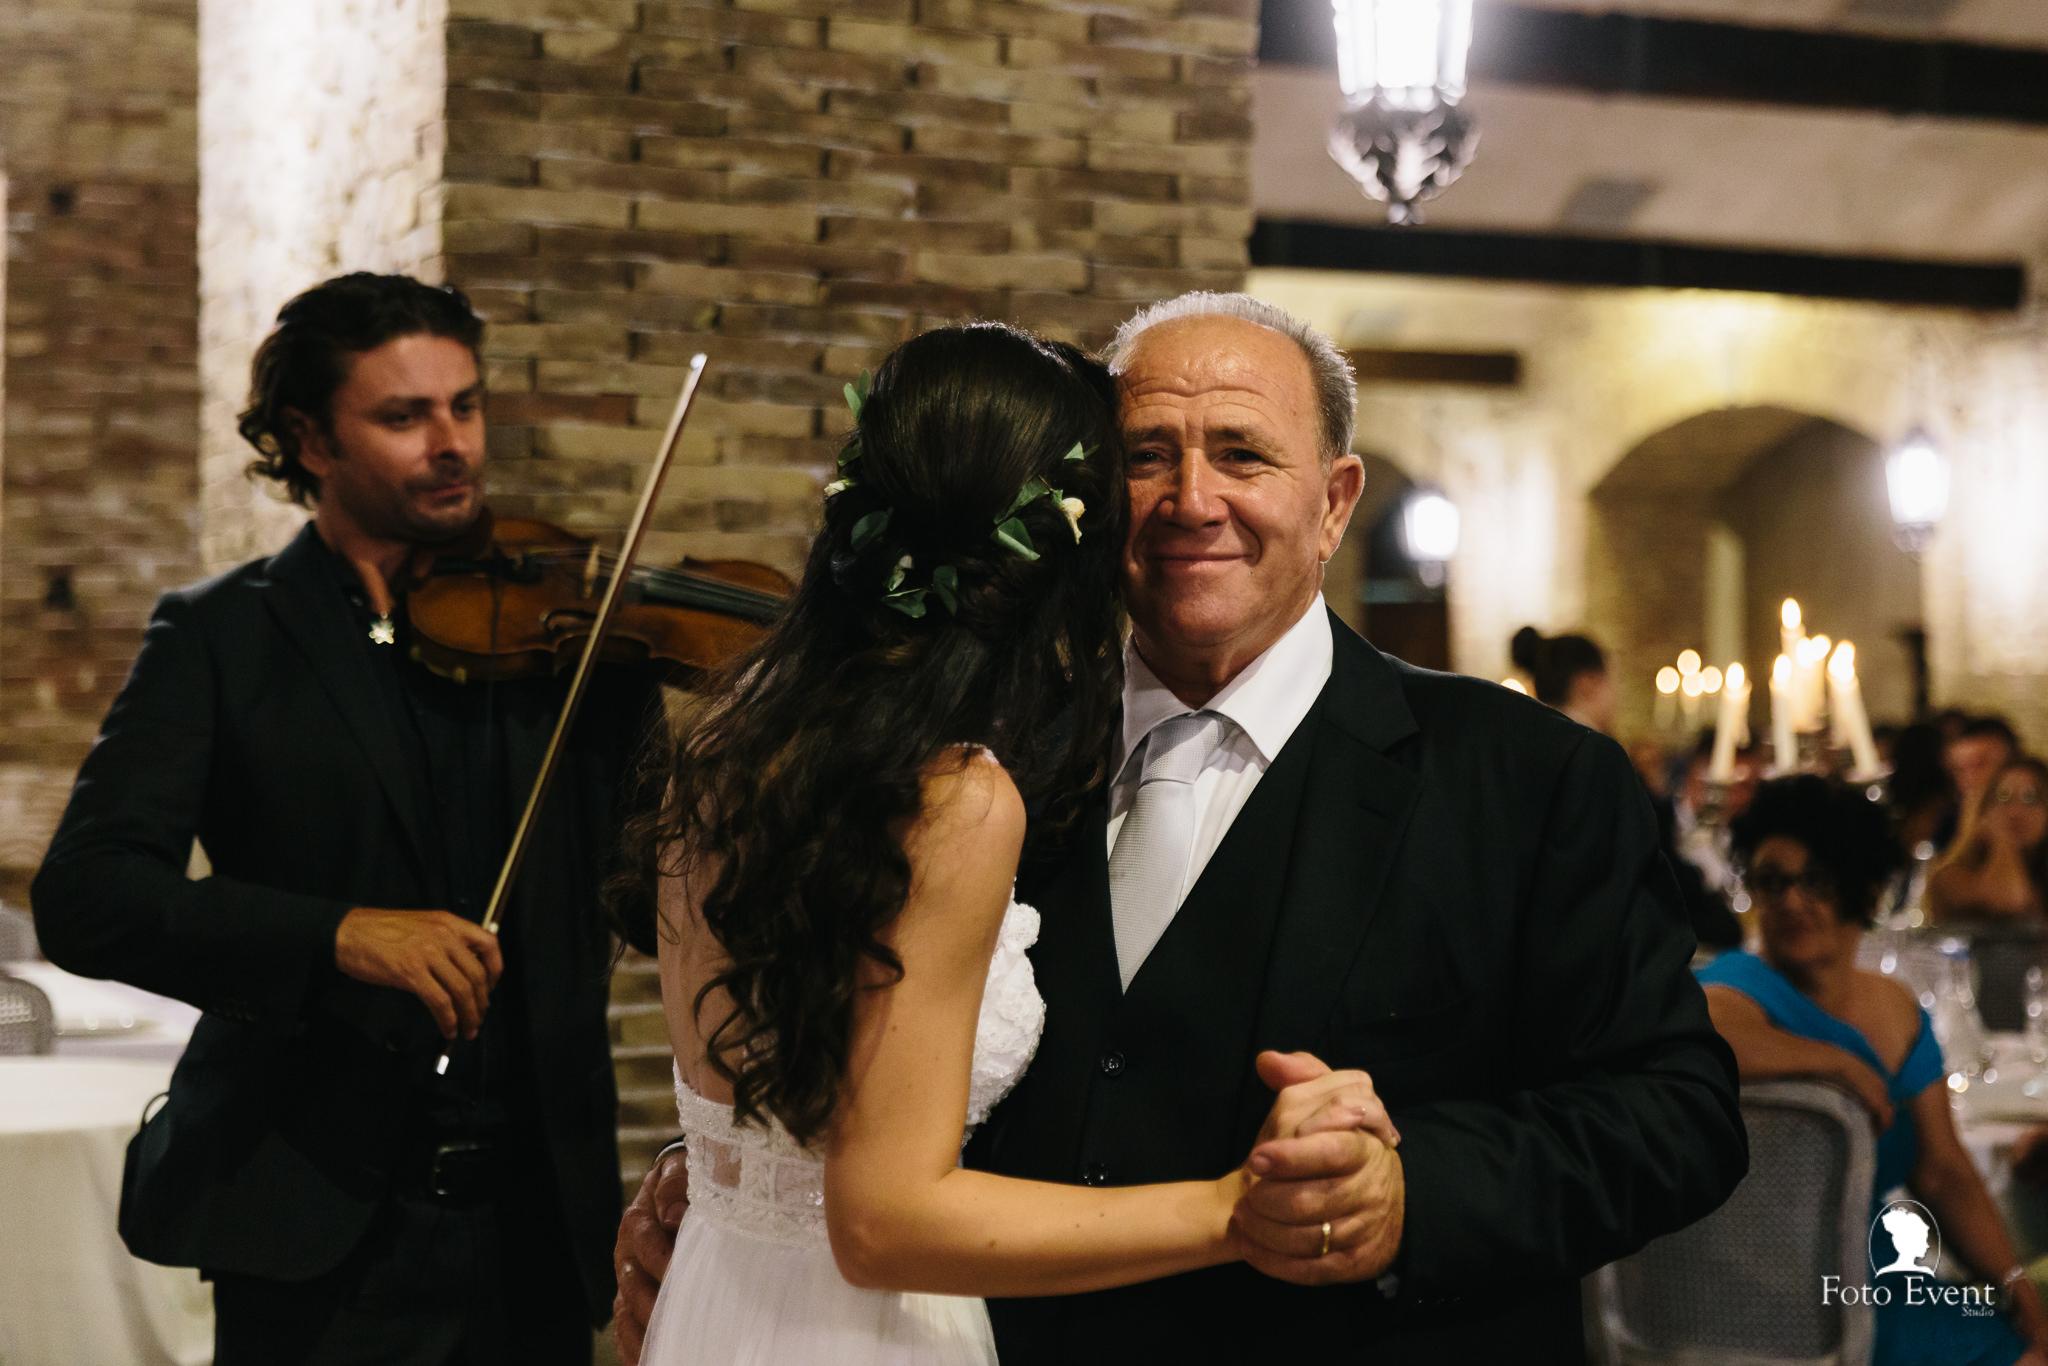 043-2019-08-23-Matrimonio-Lucia-e-Rosario-Scopelliti-5DE-2237